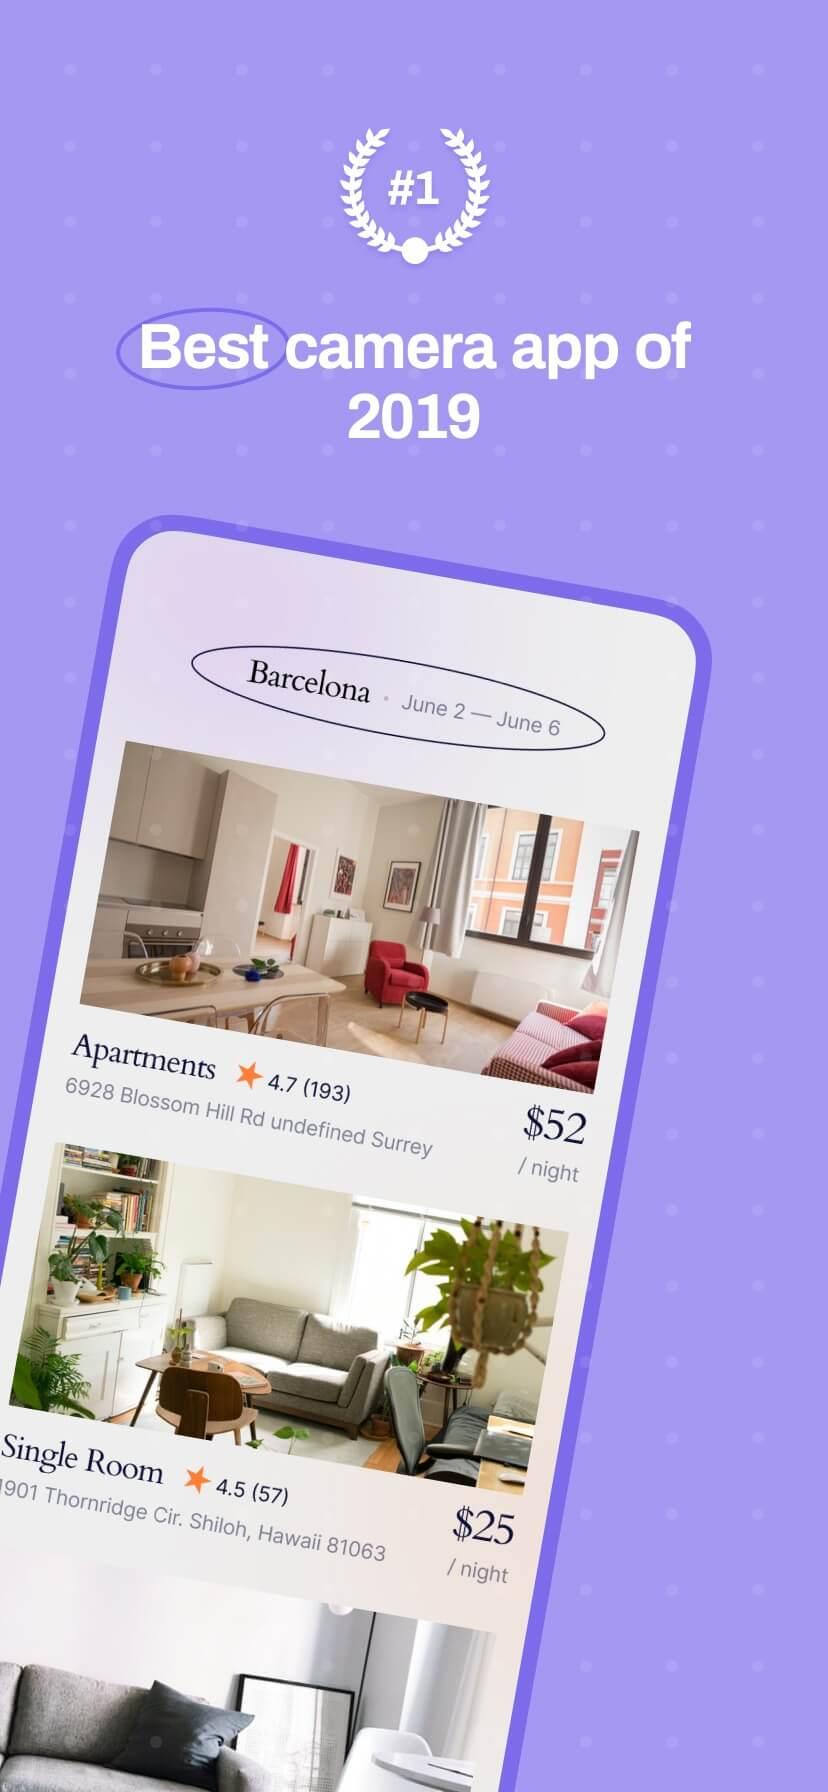 Pastel app store screenshot with simple iPhone mockup #1